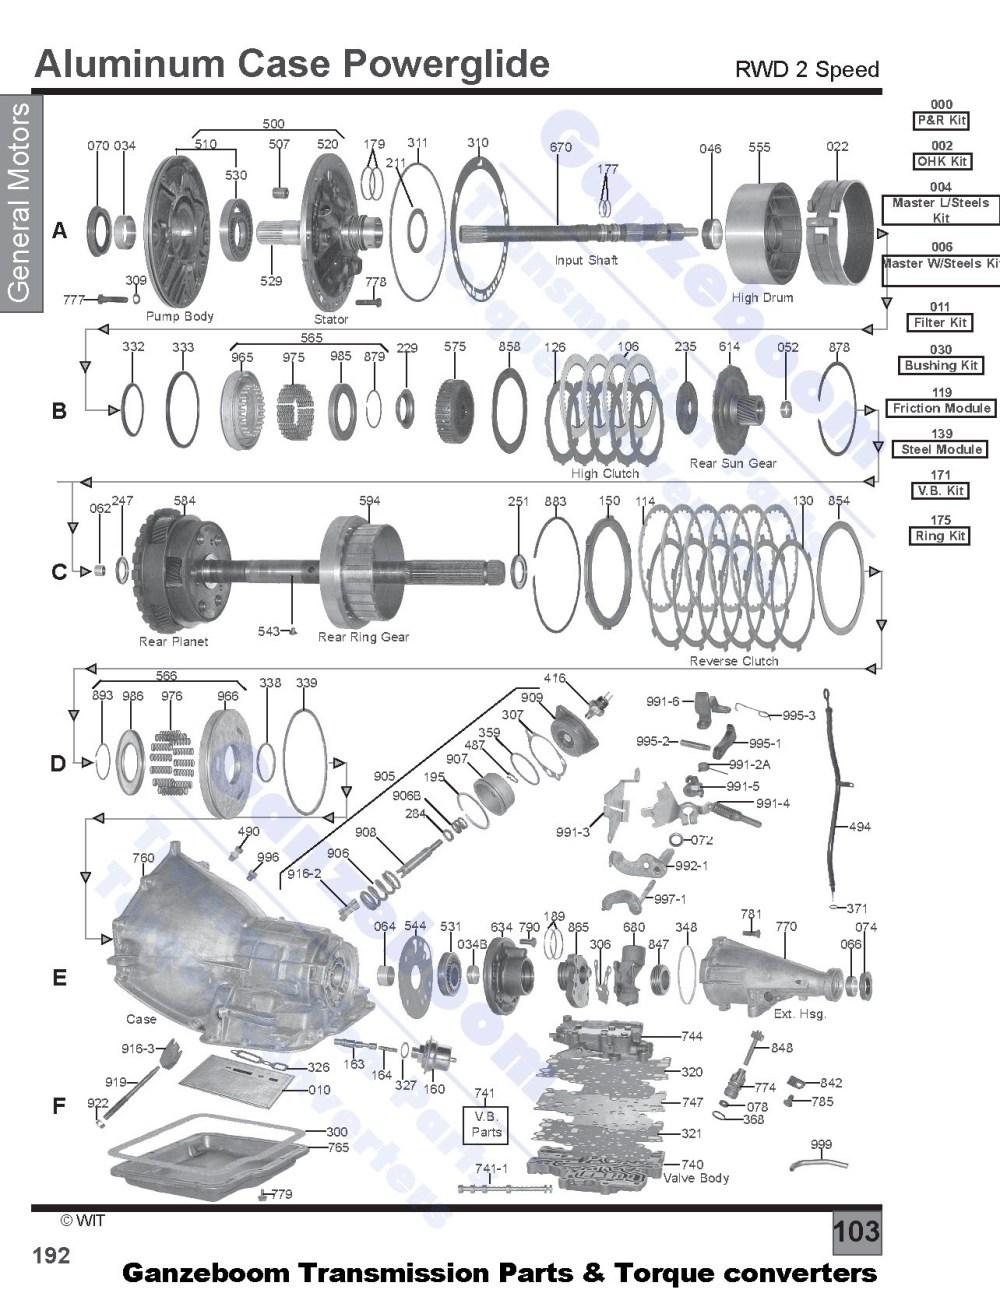 medium resolution of powerglide parts diagram wiring diagram technic powerglide transmission diagram powerglide transmission diagram